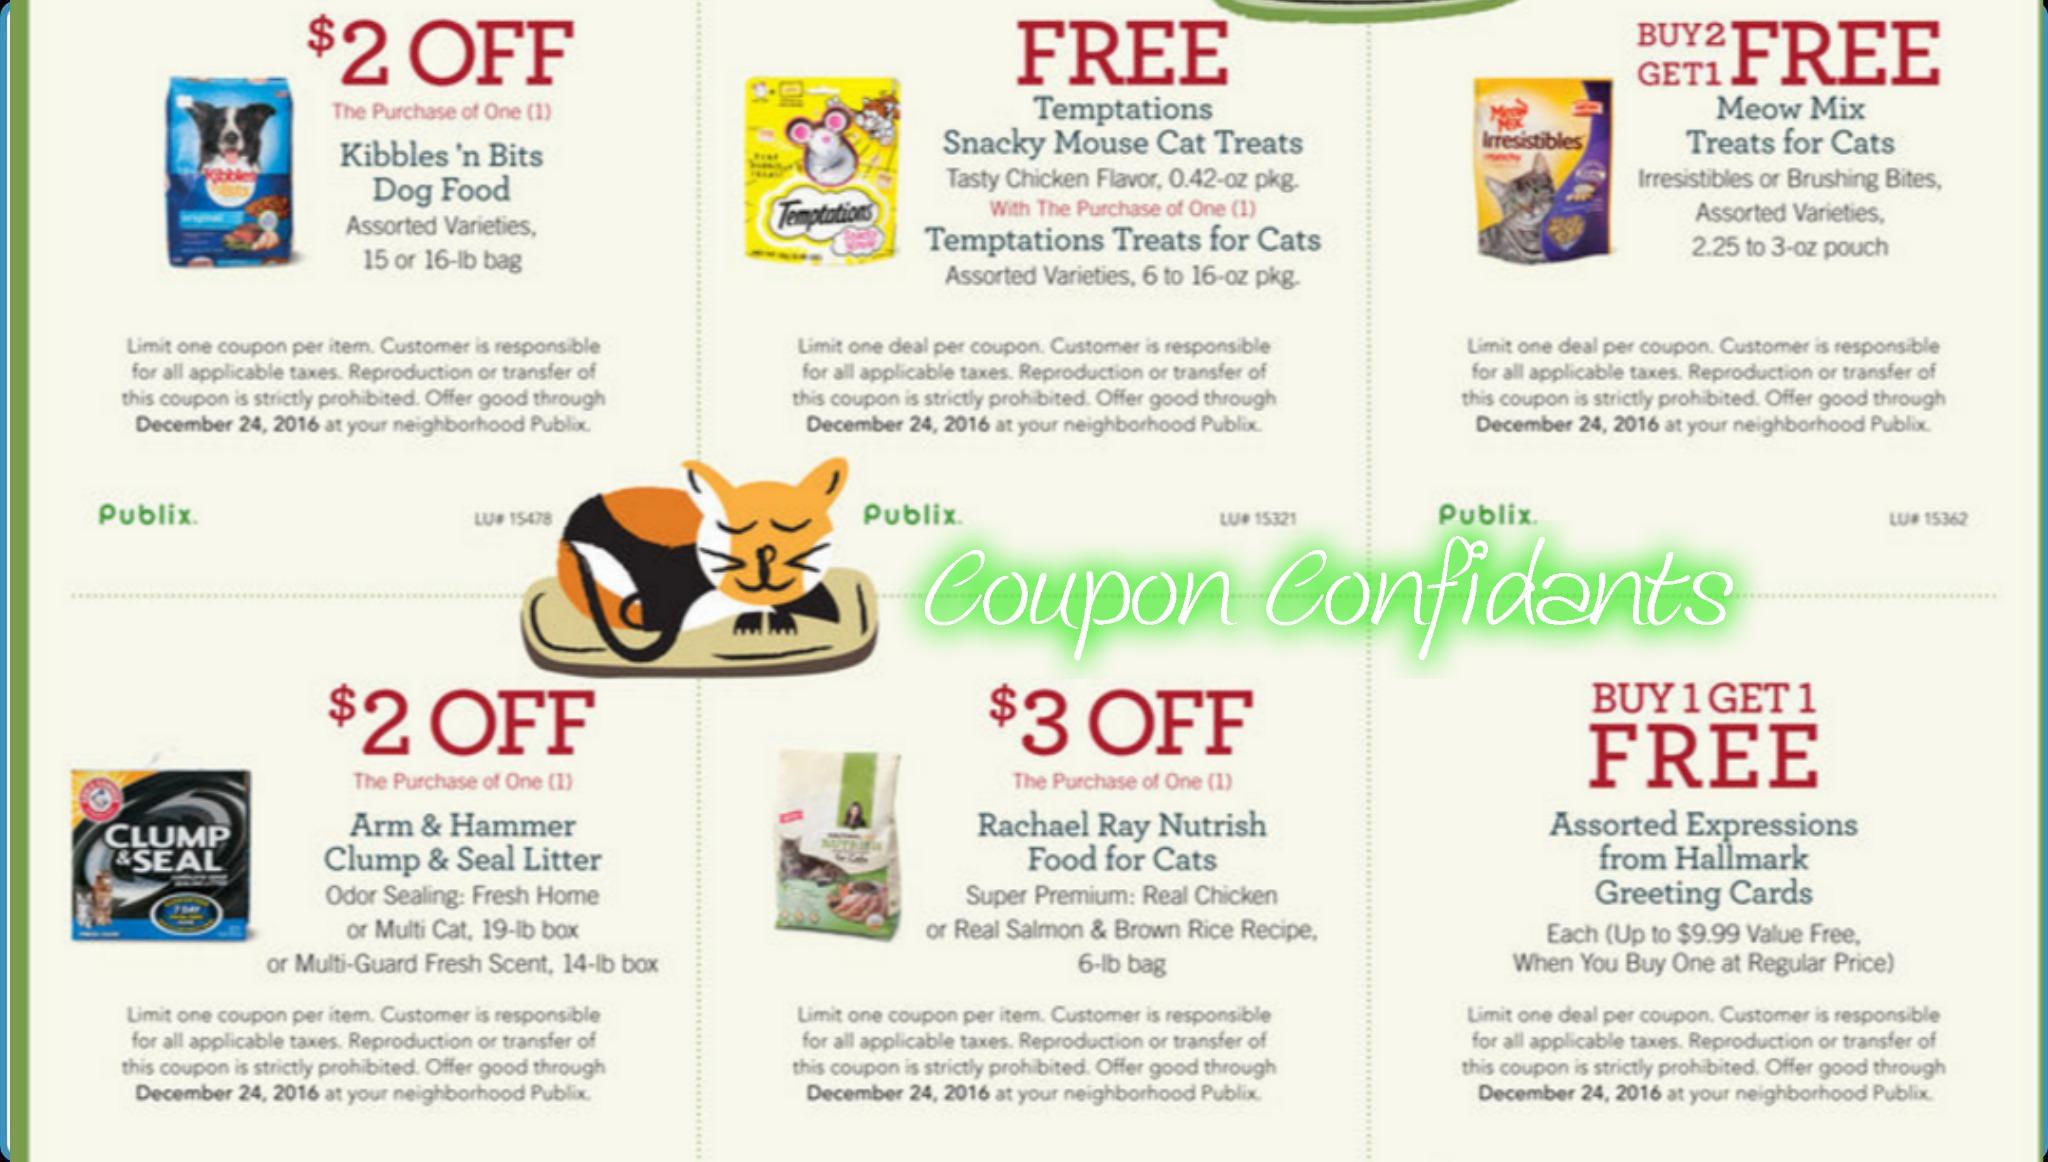 image regarding Hallmark Printable Coupons known as Fresh new Printable Publix Paws coupon codes! ⋆ Coupon Confidants